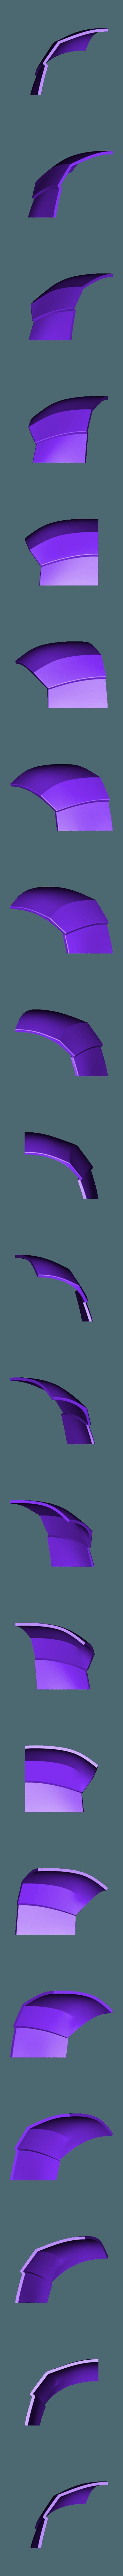 part 8.stl Download STL file Deathstroke Injustice Helmet • 3D printable model, VillainousPropShop